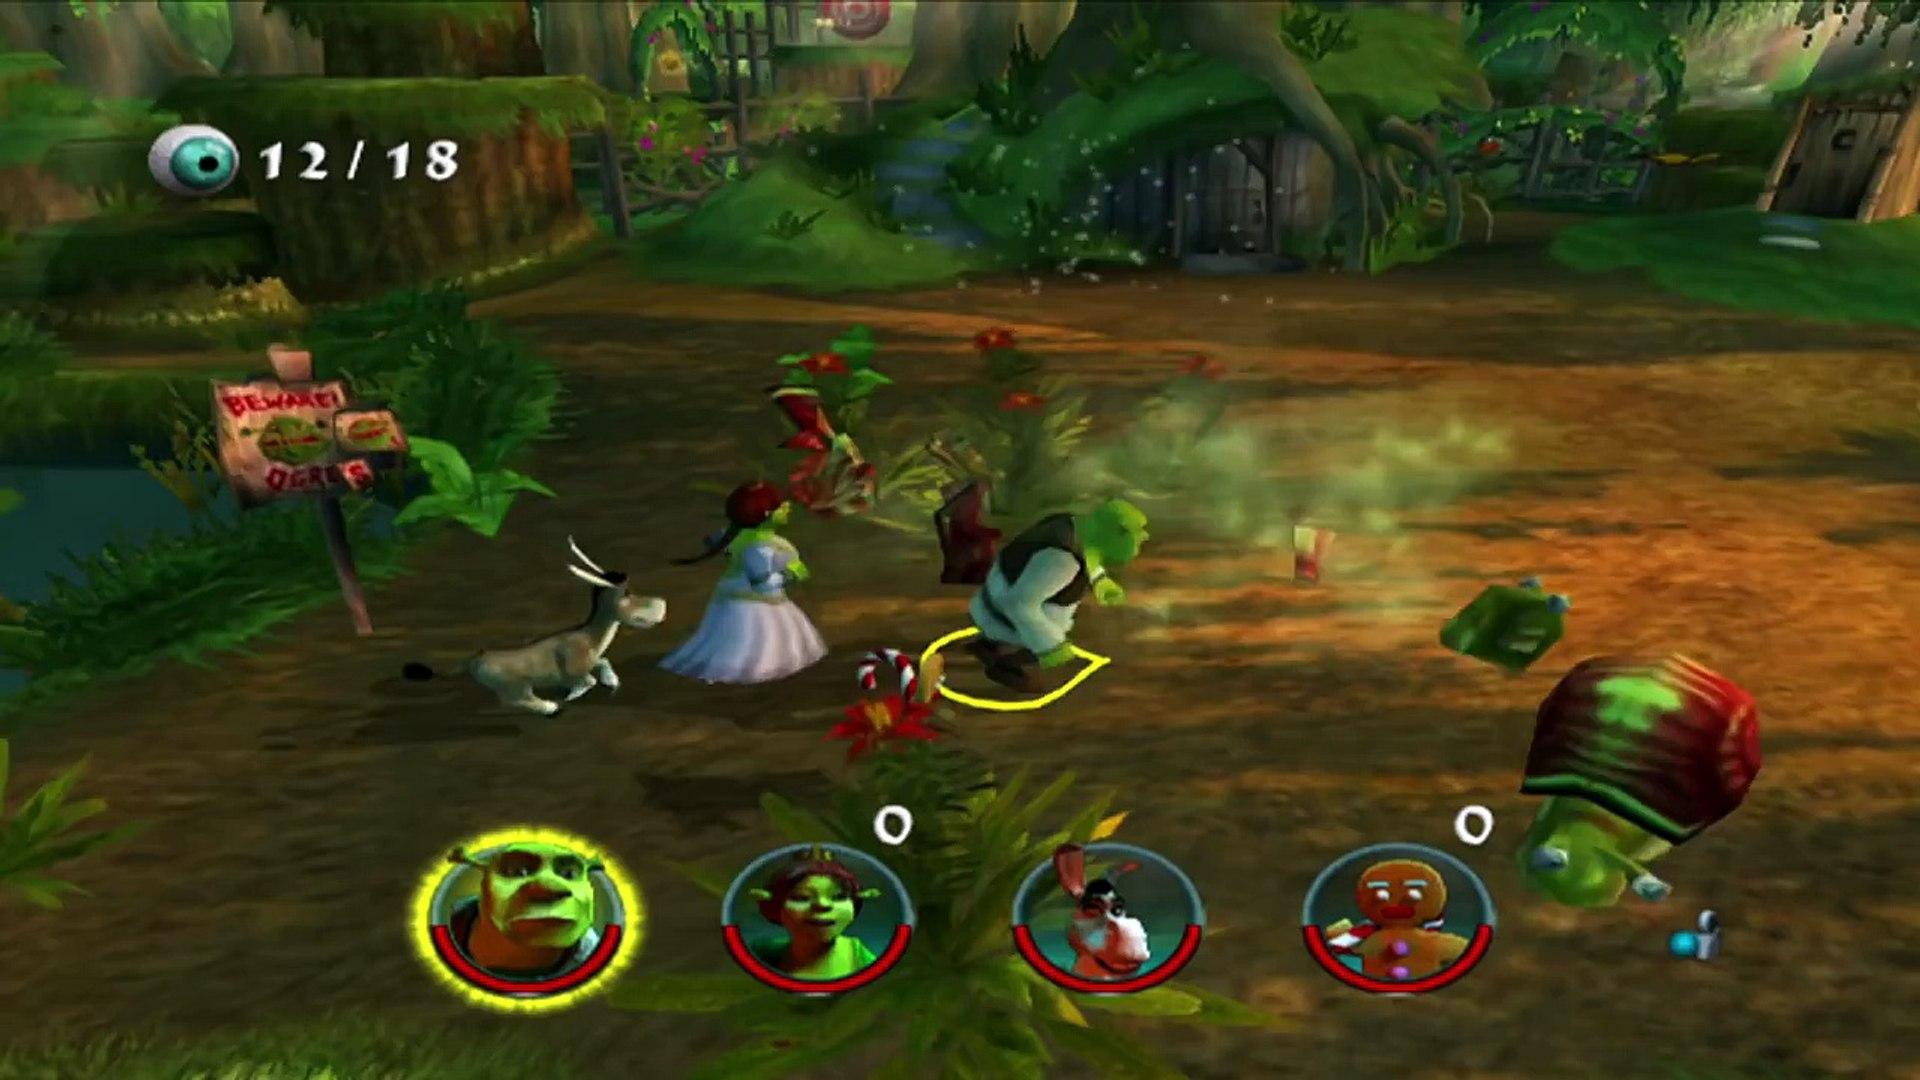 Shrek 2 The Game Walkthrough Level 1 Shreks Swamp Part 1 Ps2 Xbox Gamecube Hd Video Dailymotion